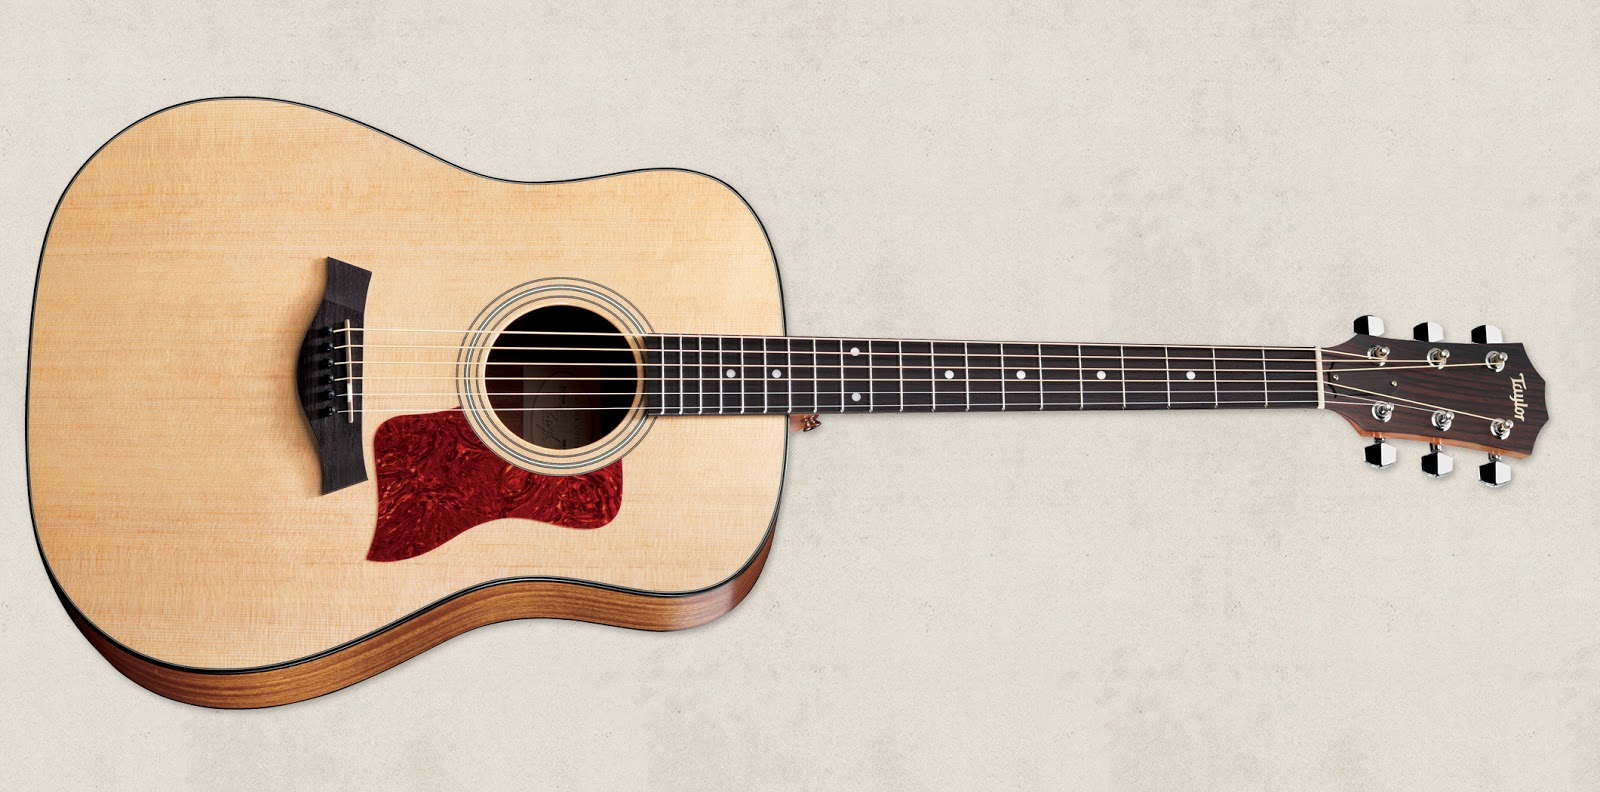 taylor guitars wallpapers - photo #25